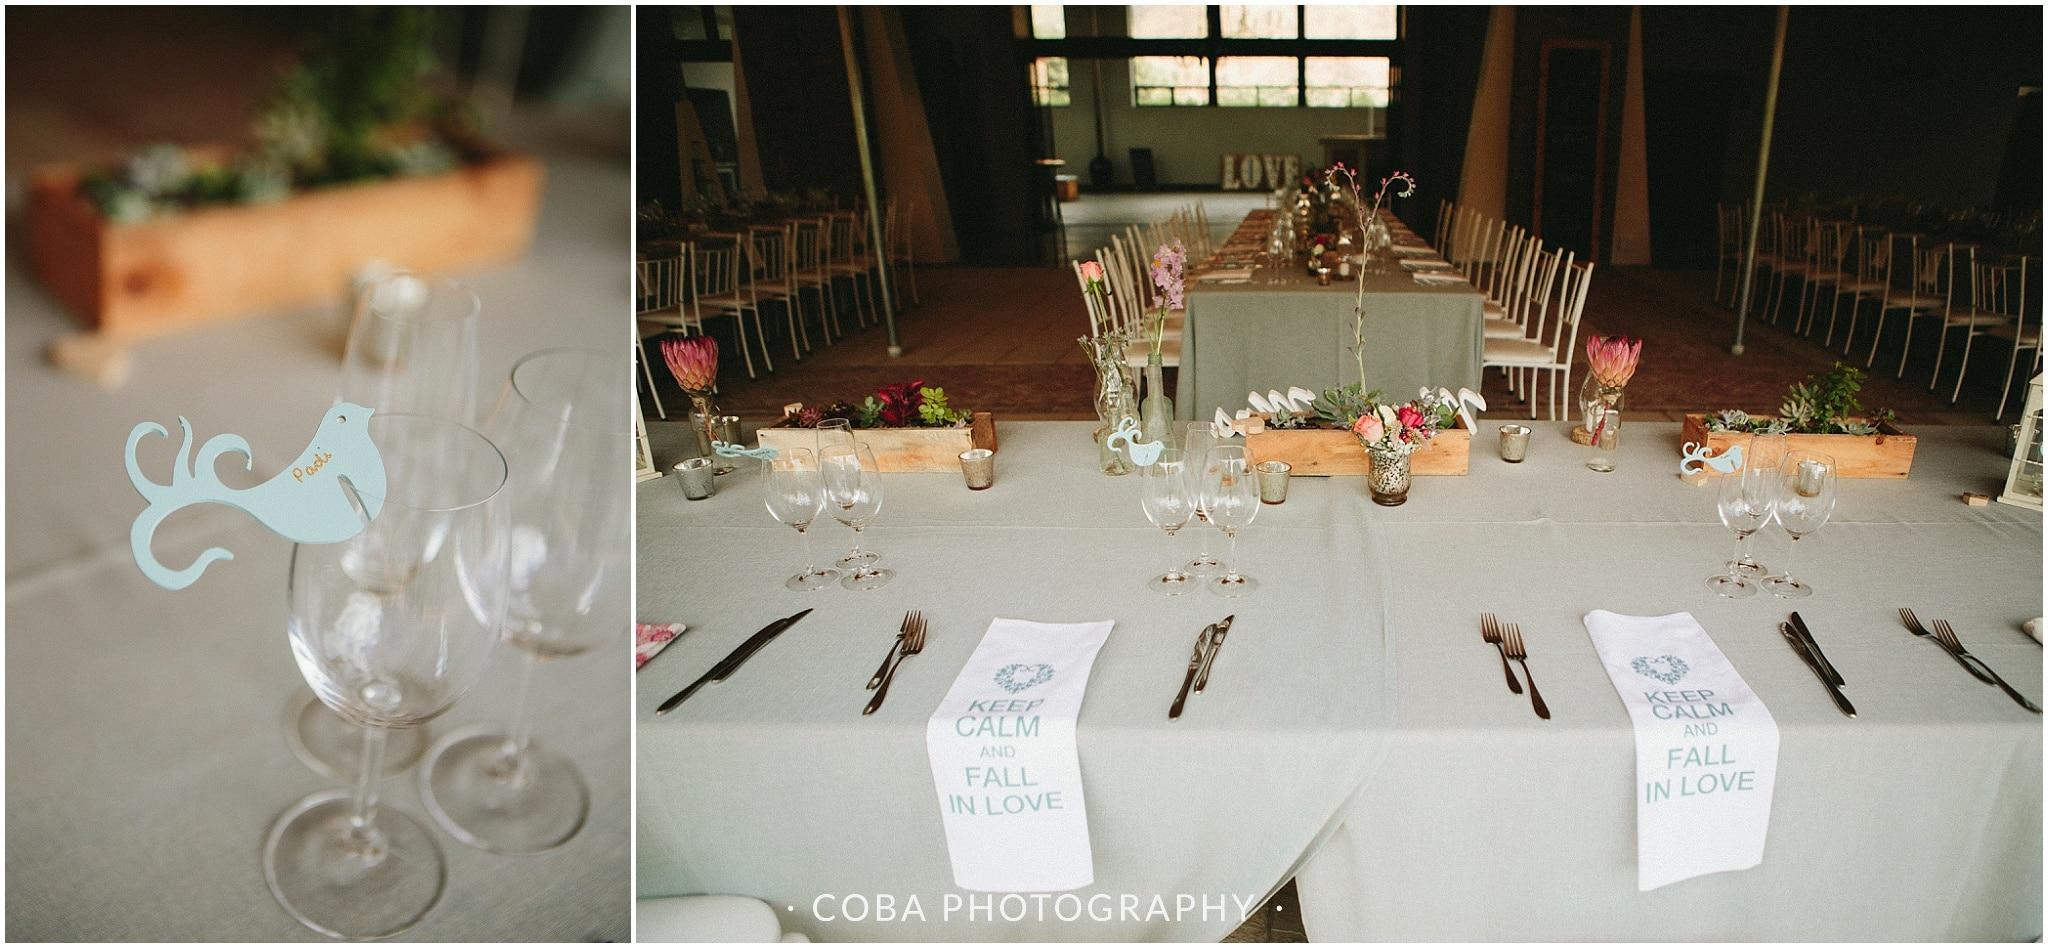 John&Pad - Olive Rock - Coba Photography (15)